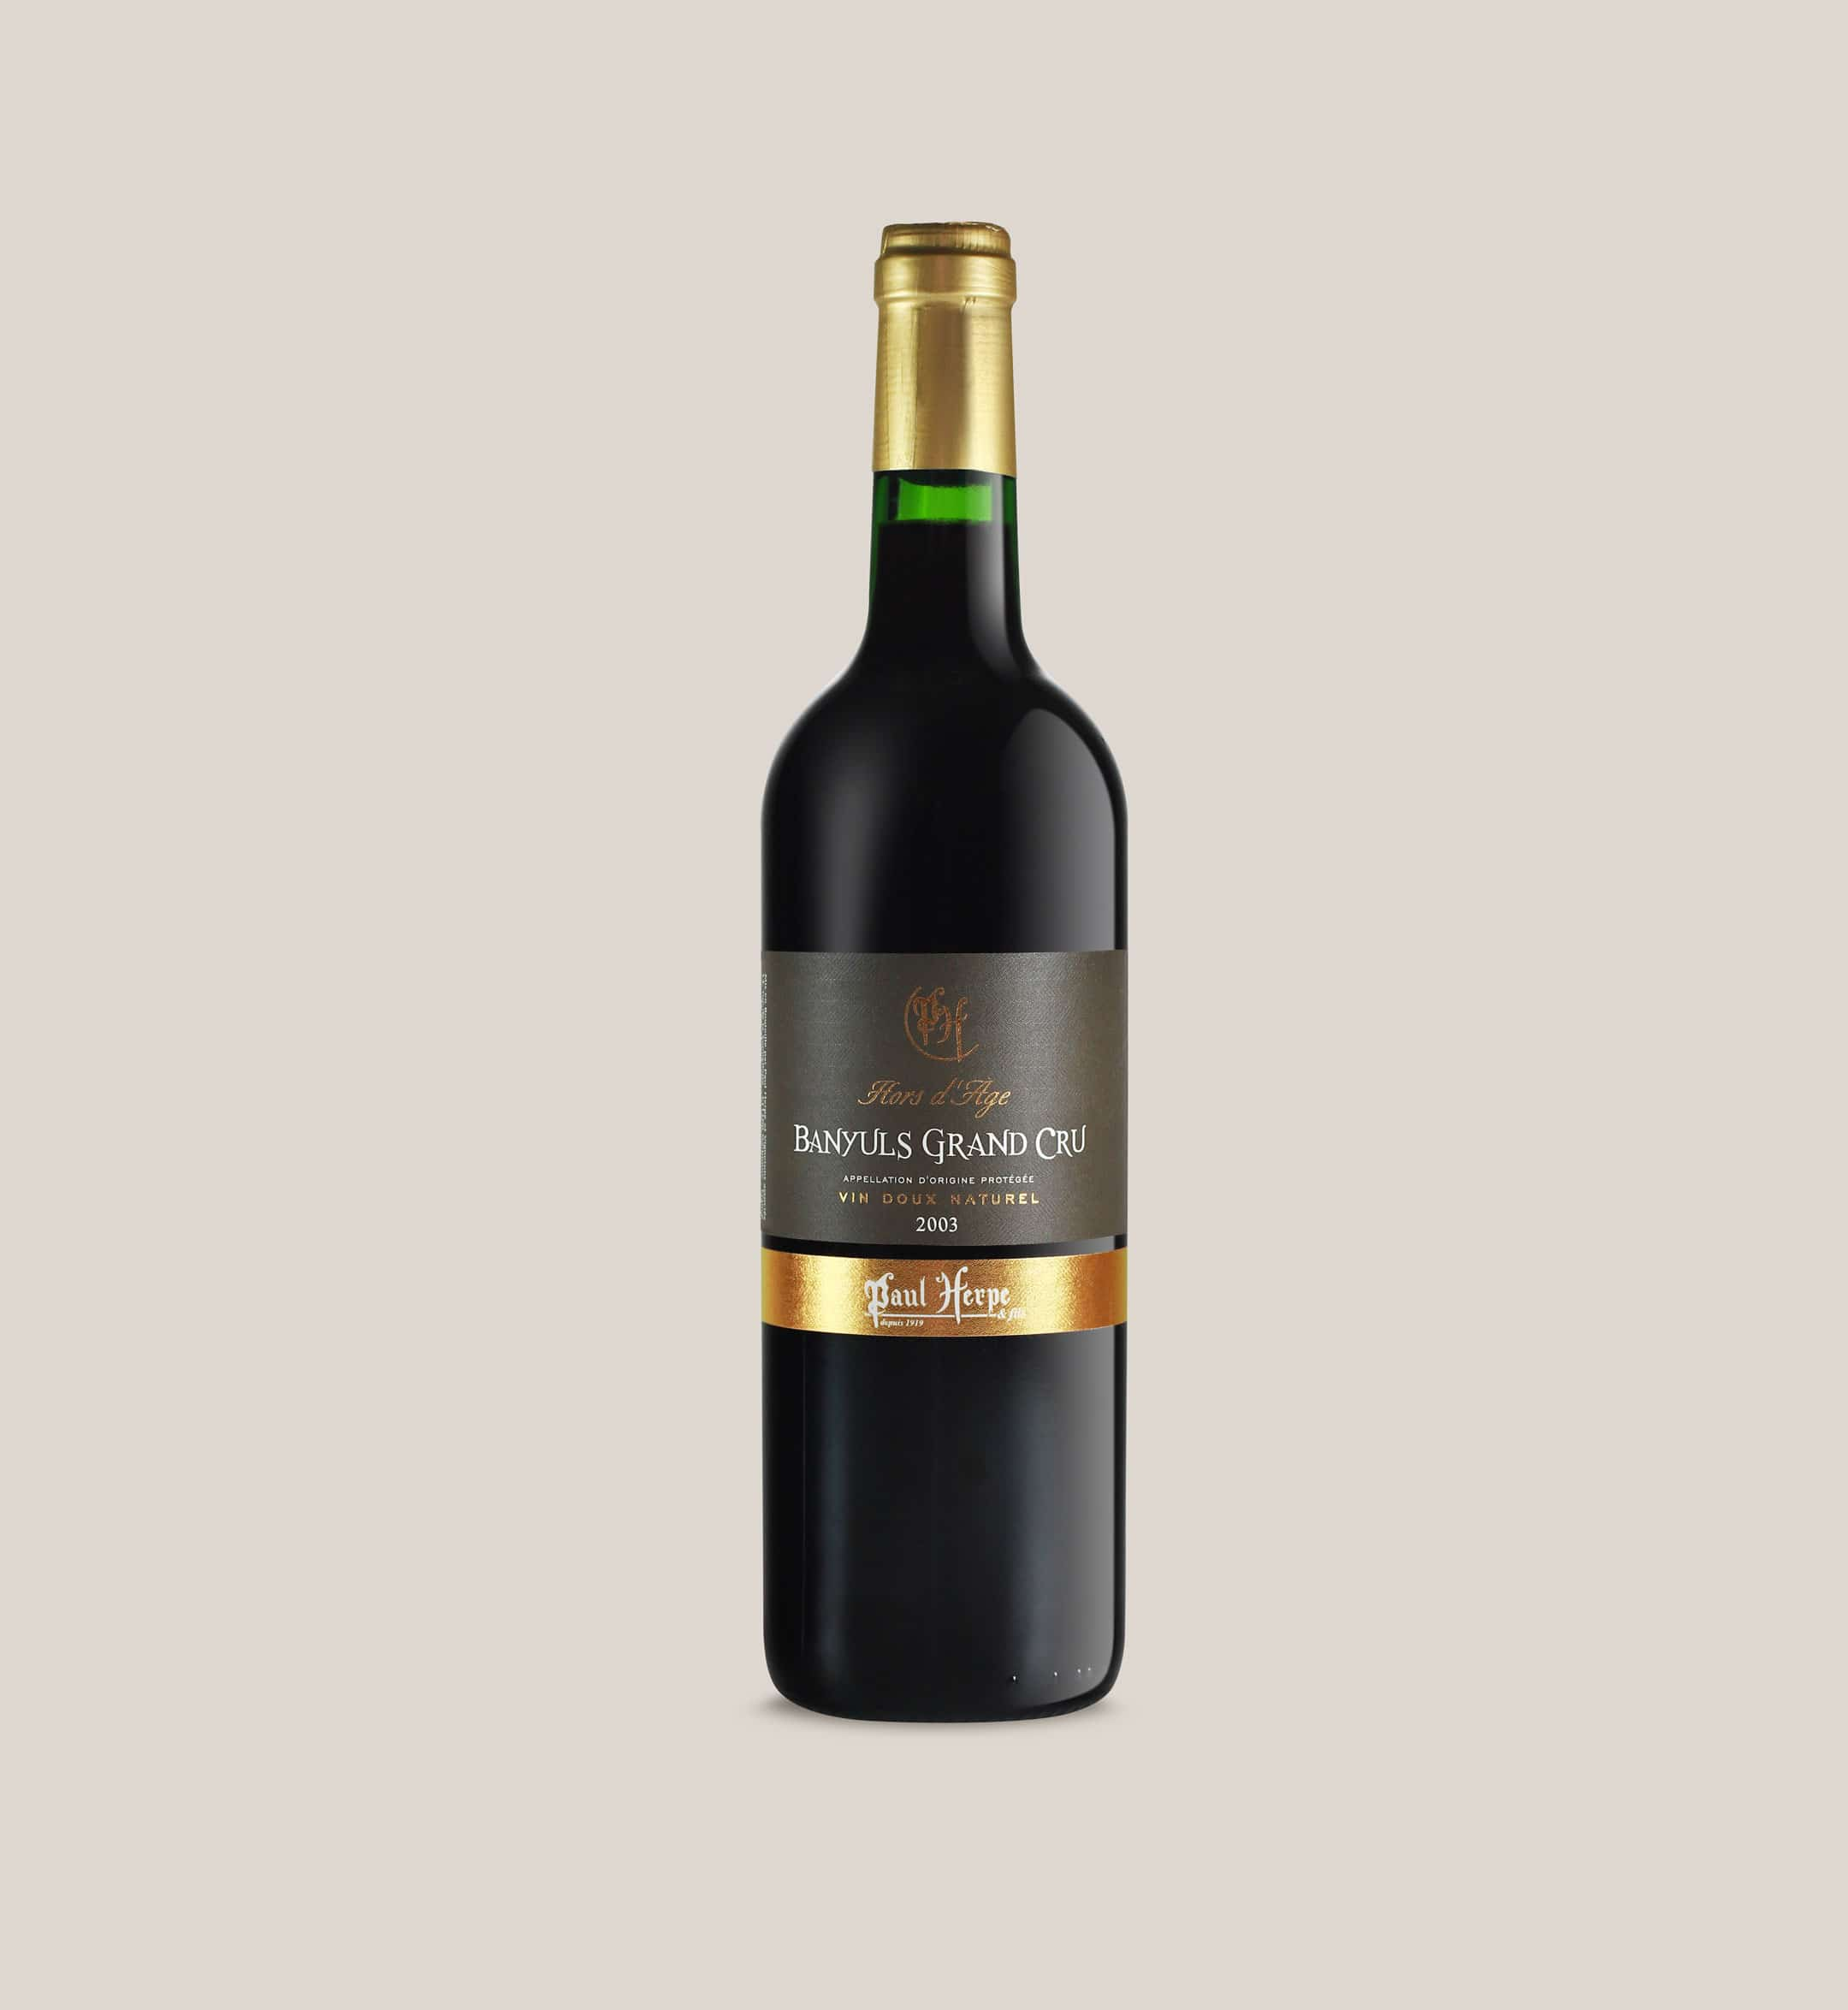 Banyuls grand cru bouteille vin doux naturel collection premium